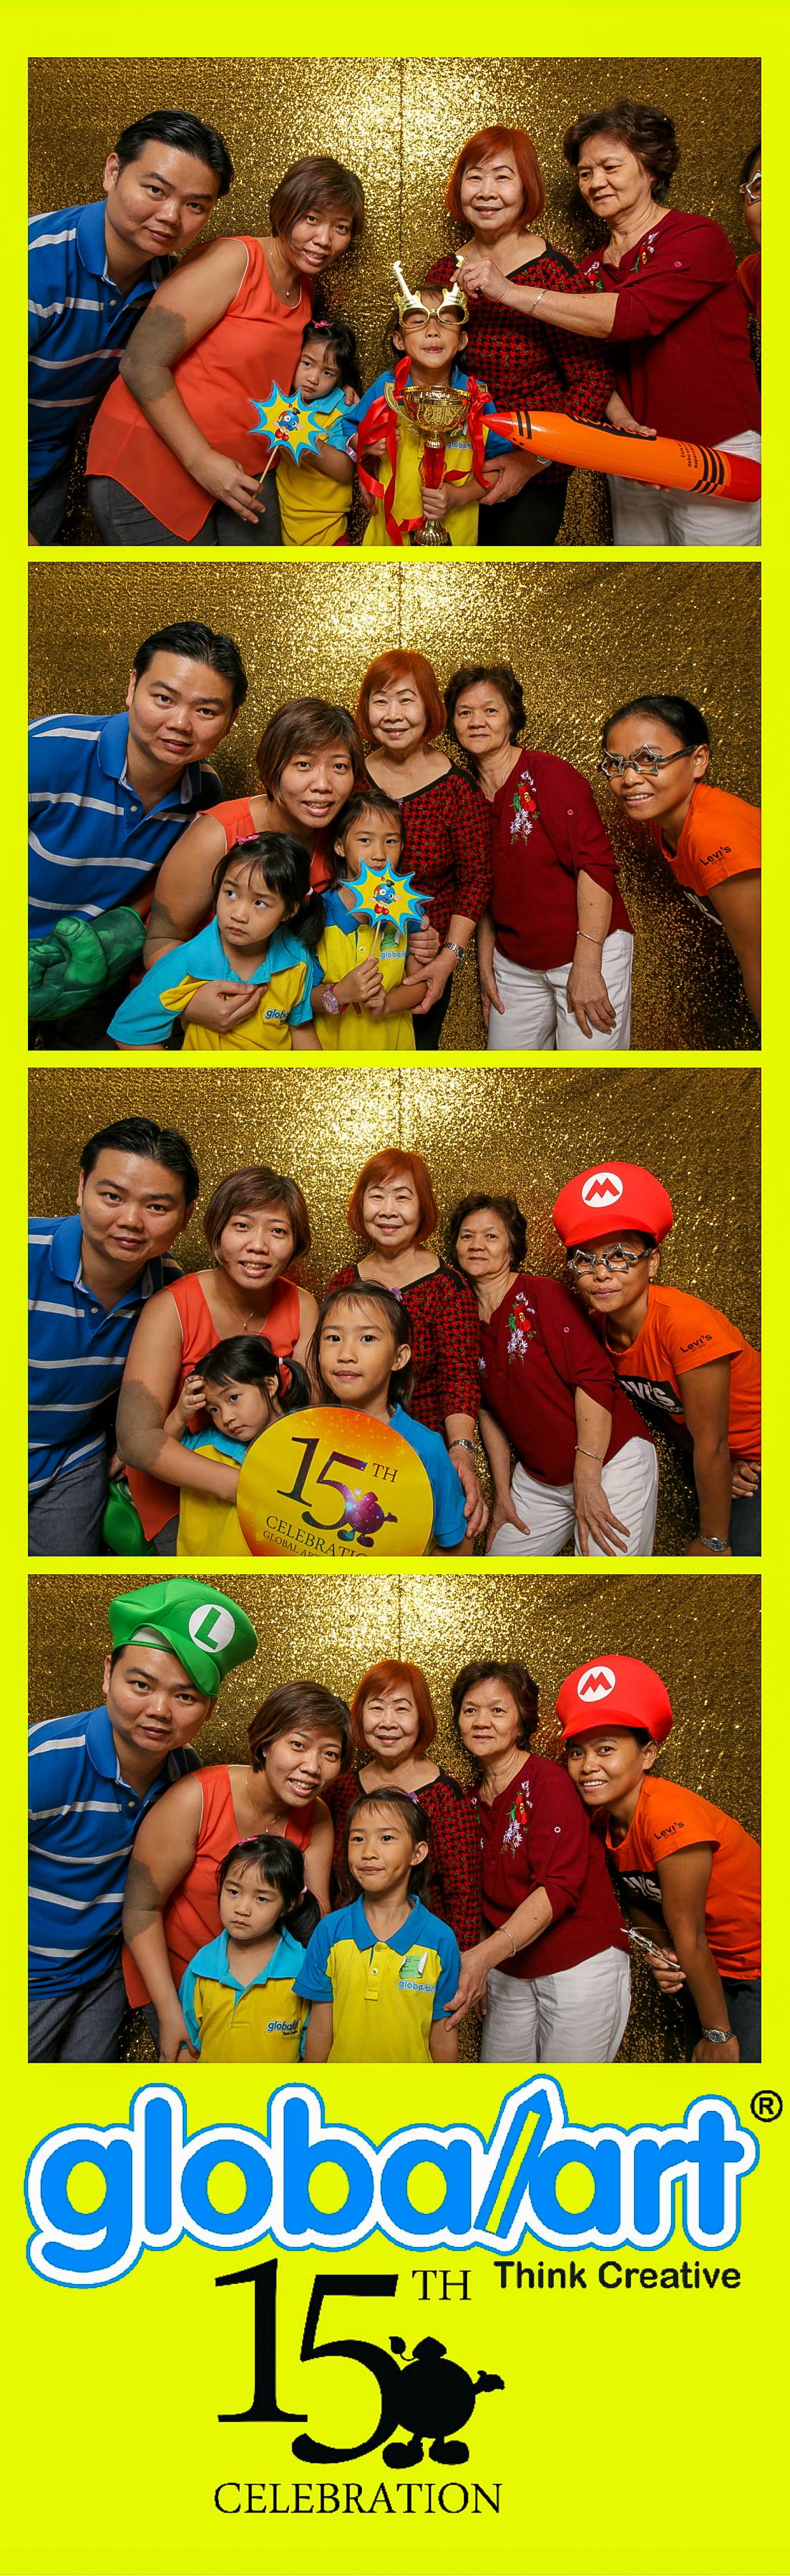 global art photo booth singapore (22)